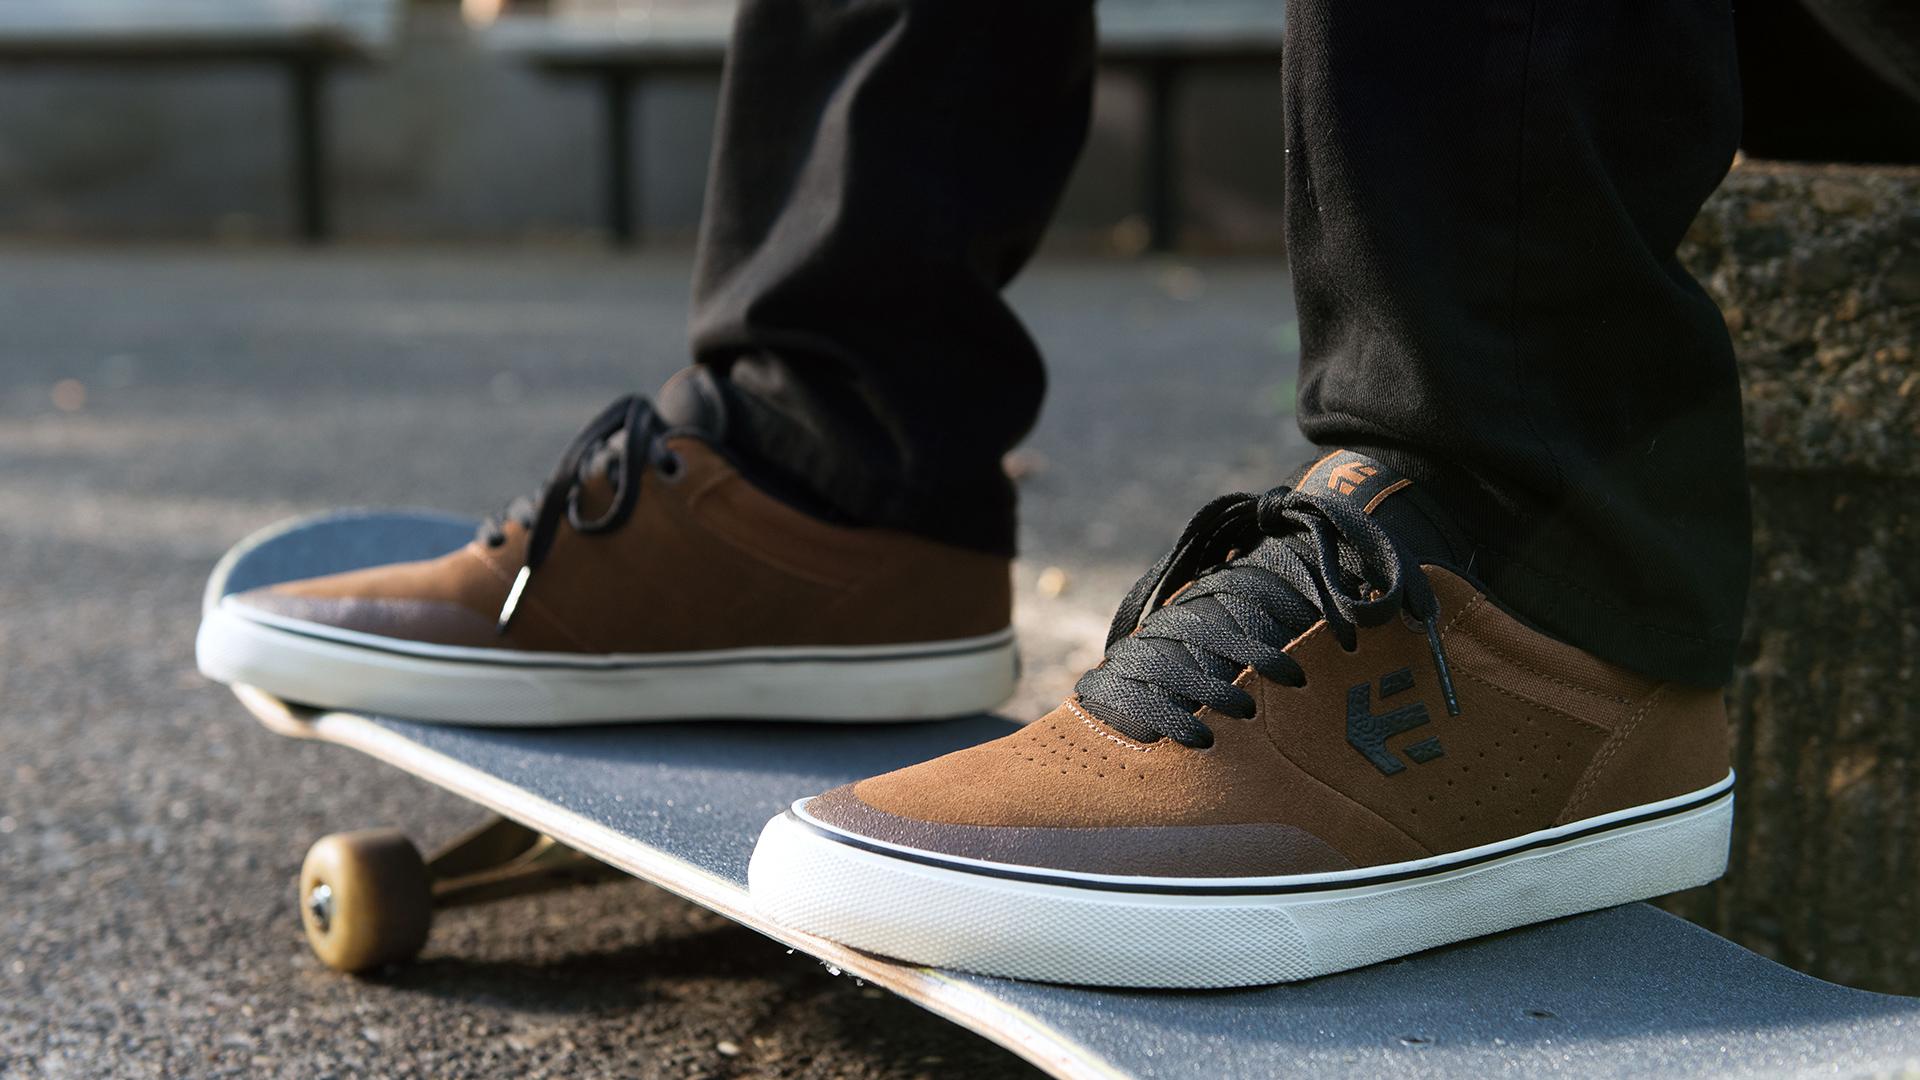 Etnies shoes on a skateboard